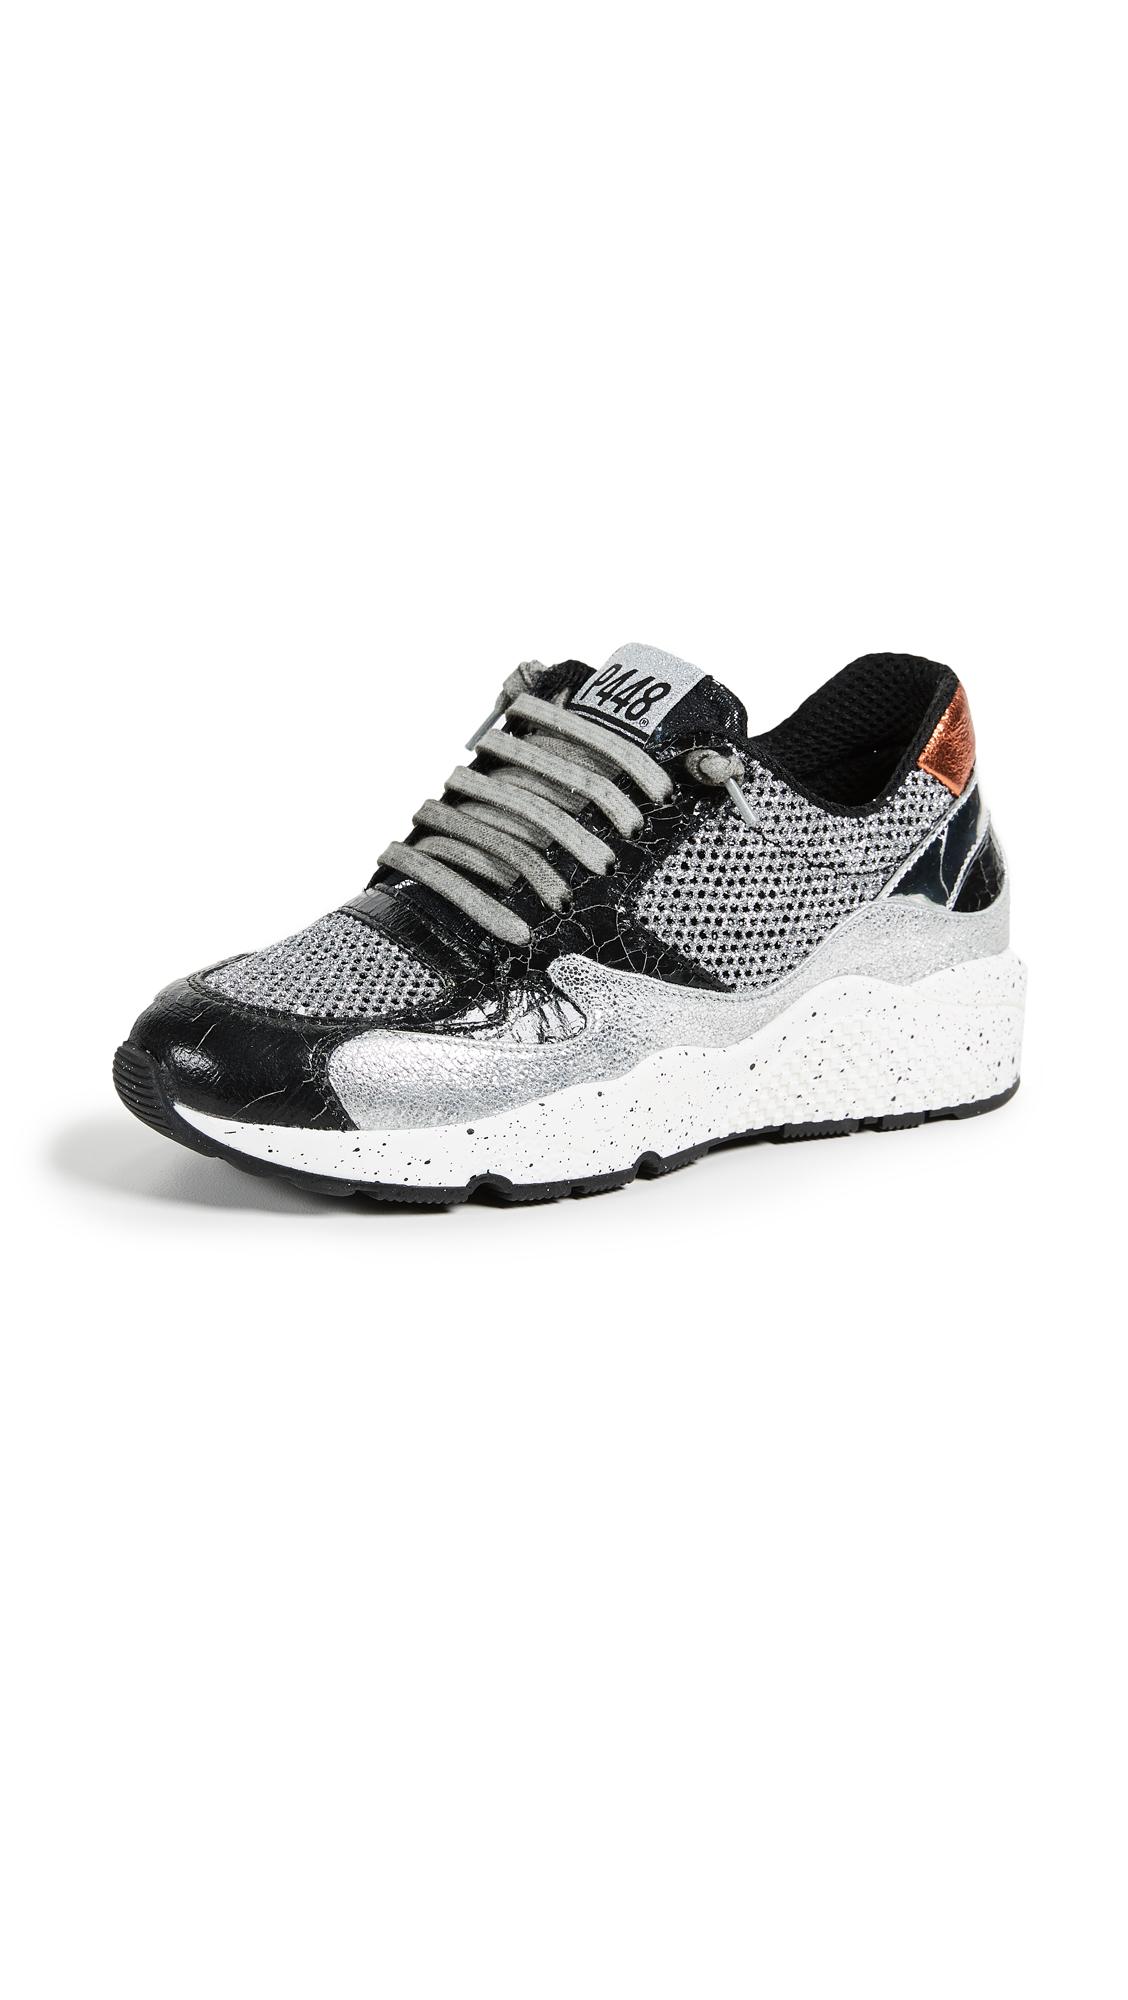 P448 America Sneakers - Silver